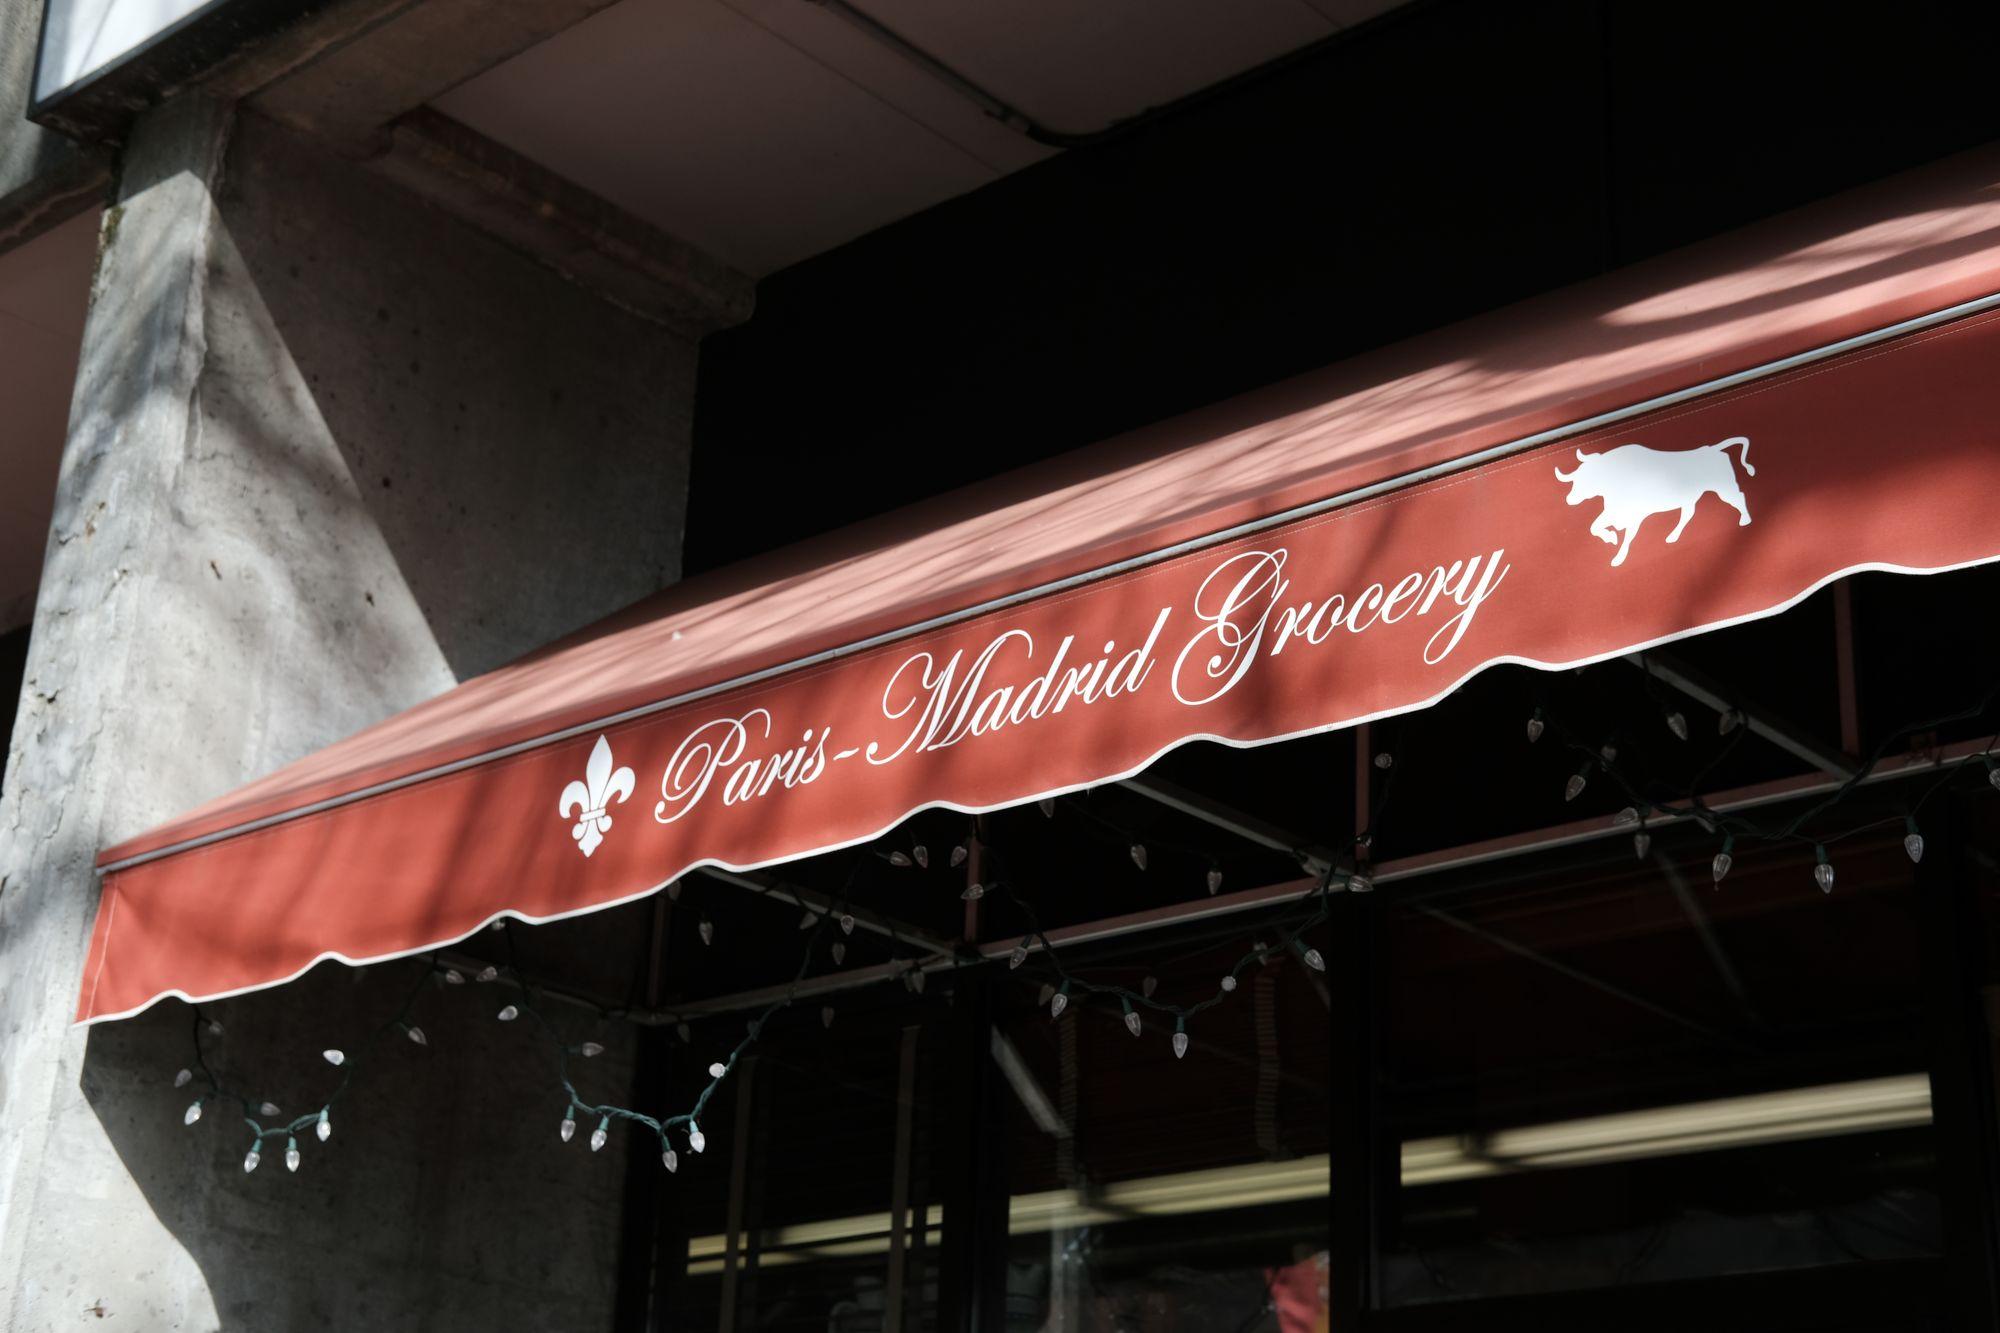 Paris Madrid Grocery Seattle